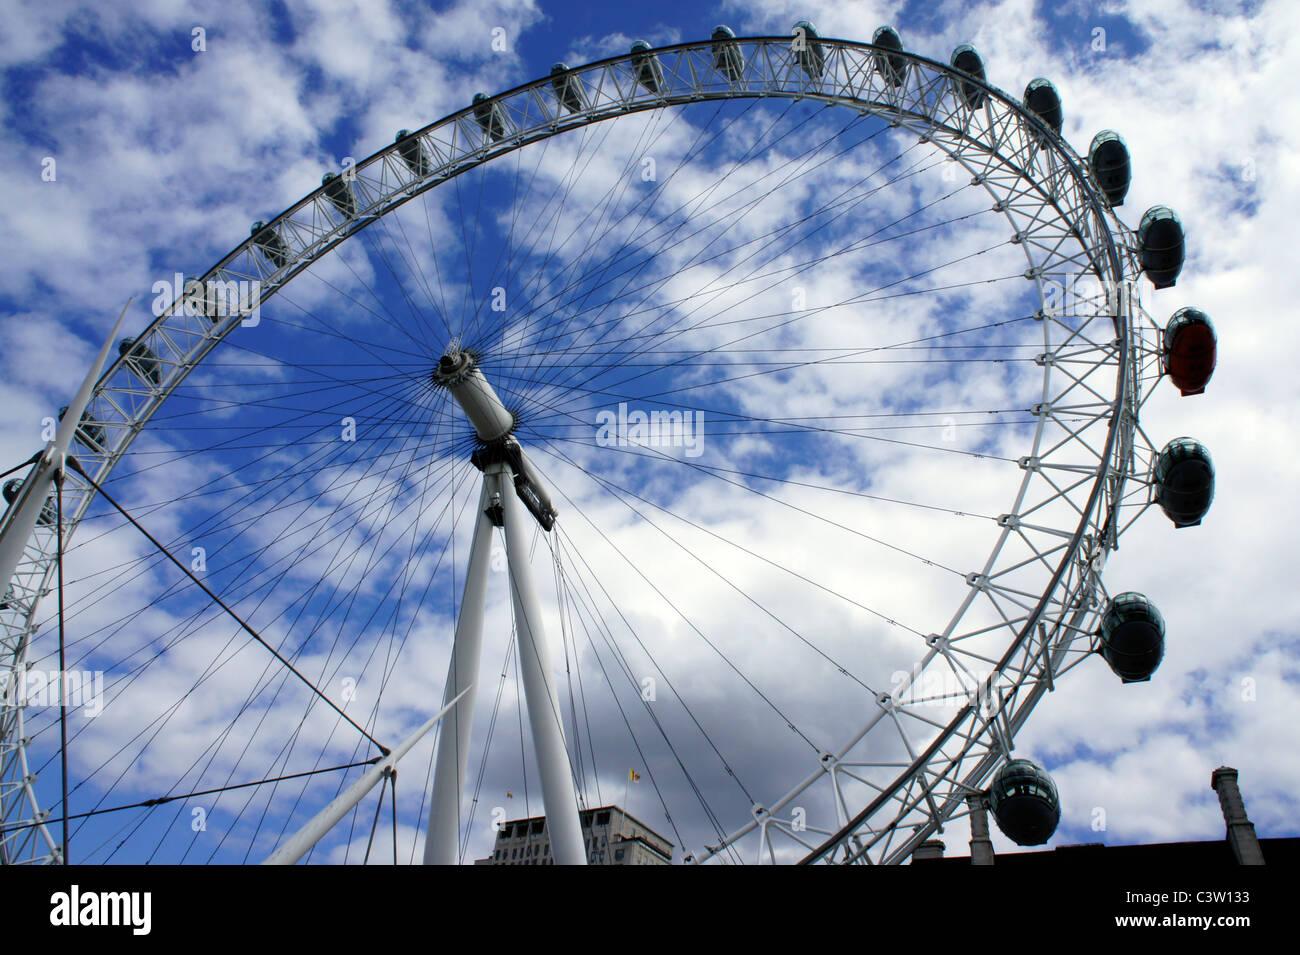 London Eye, Southbank London embankment - Stock Image